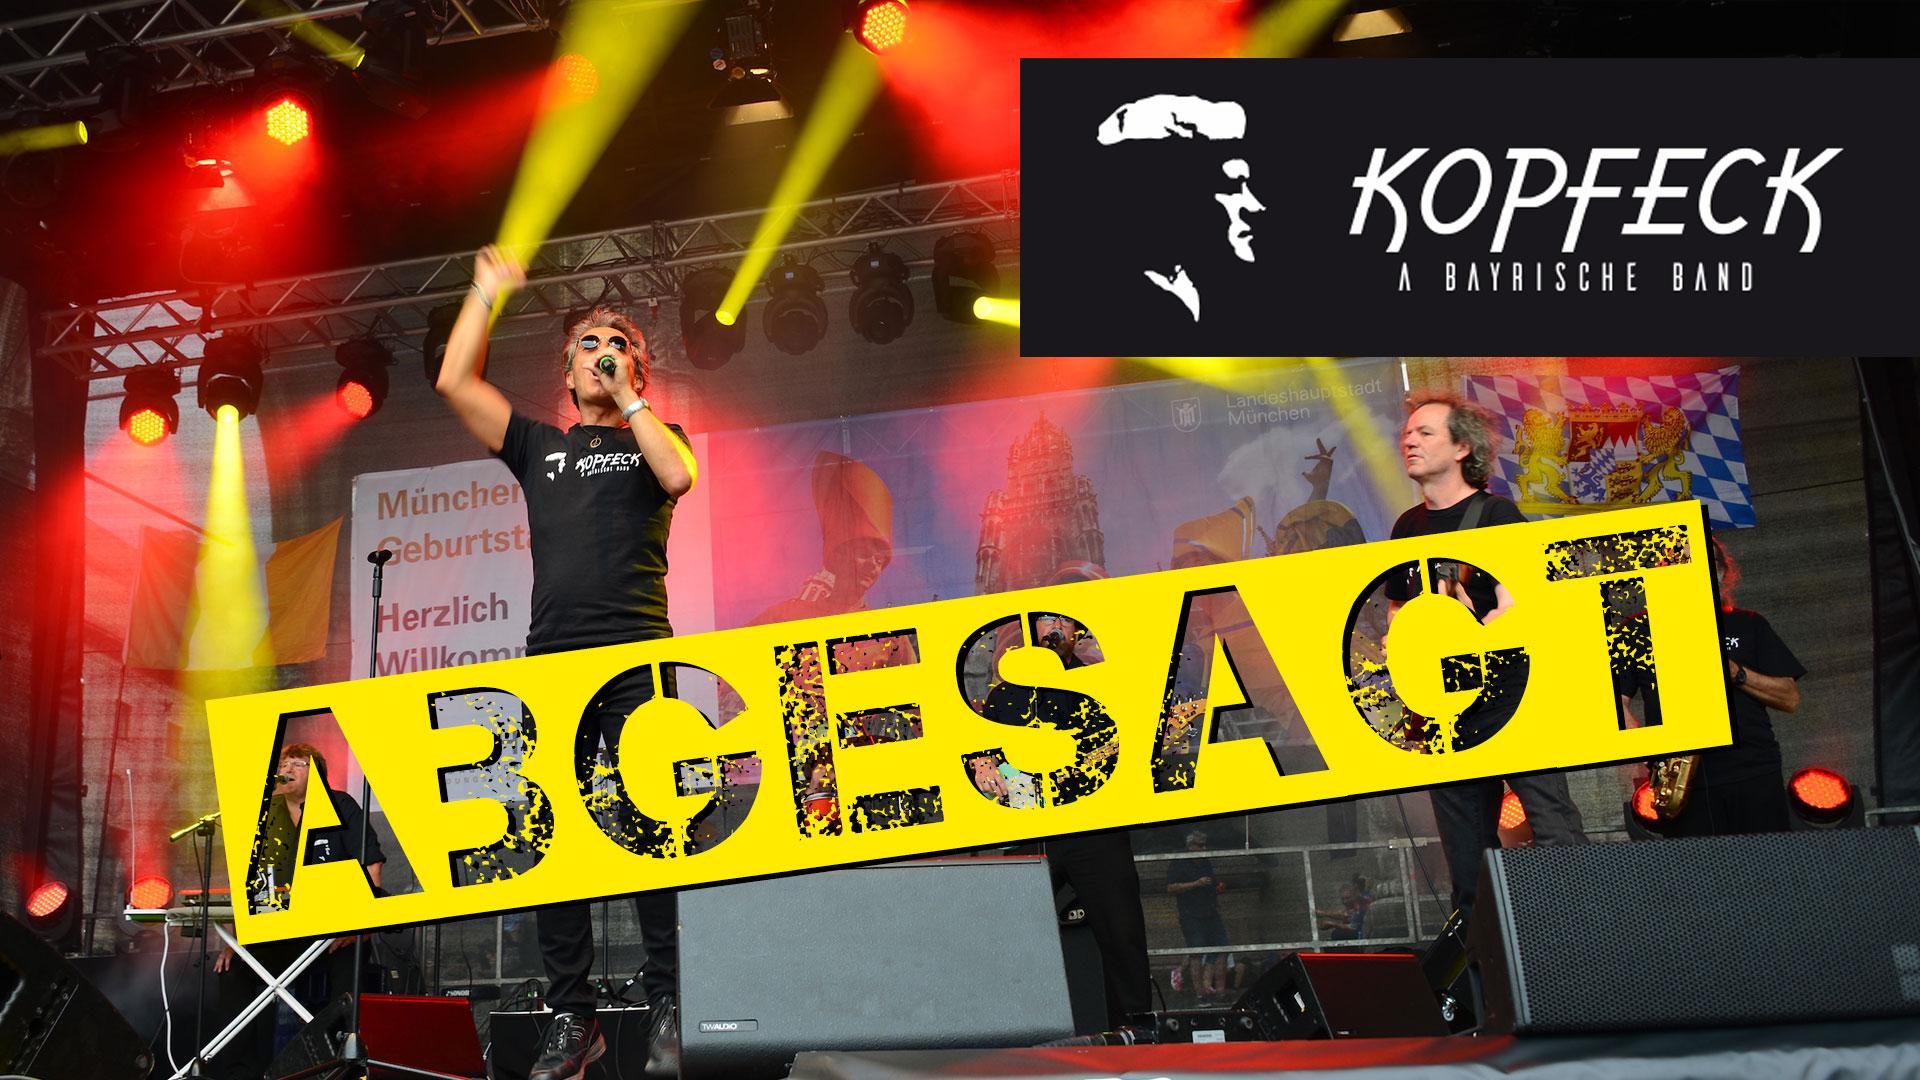 ABGESAGT: Kopfeck - a bayrische Band